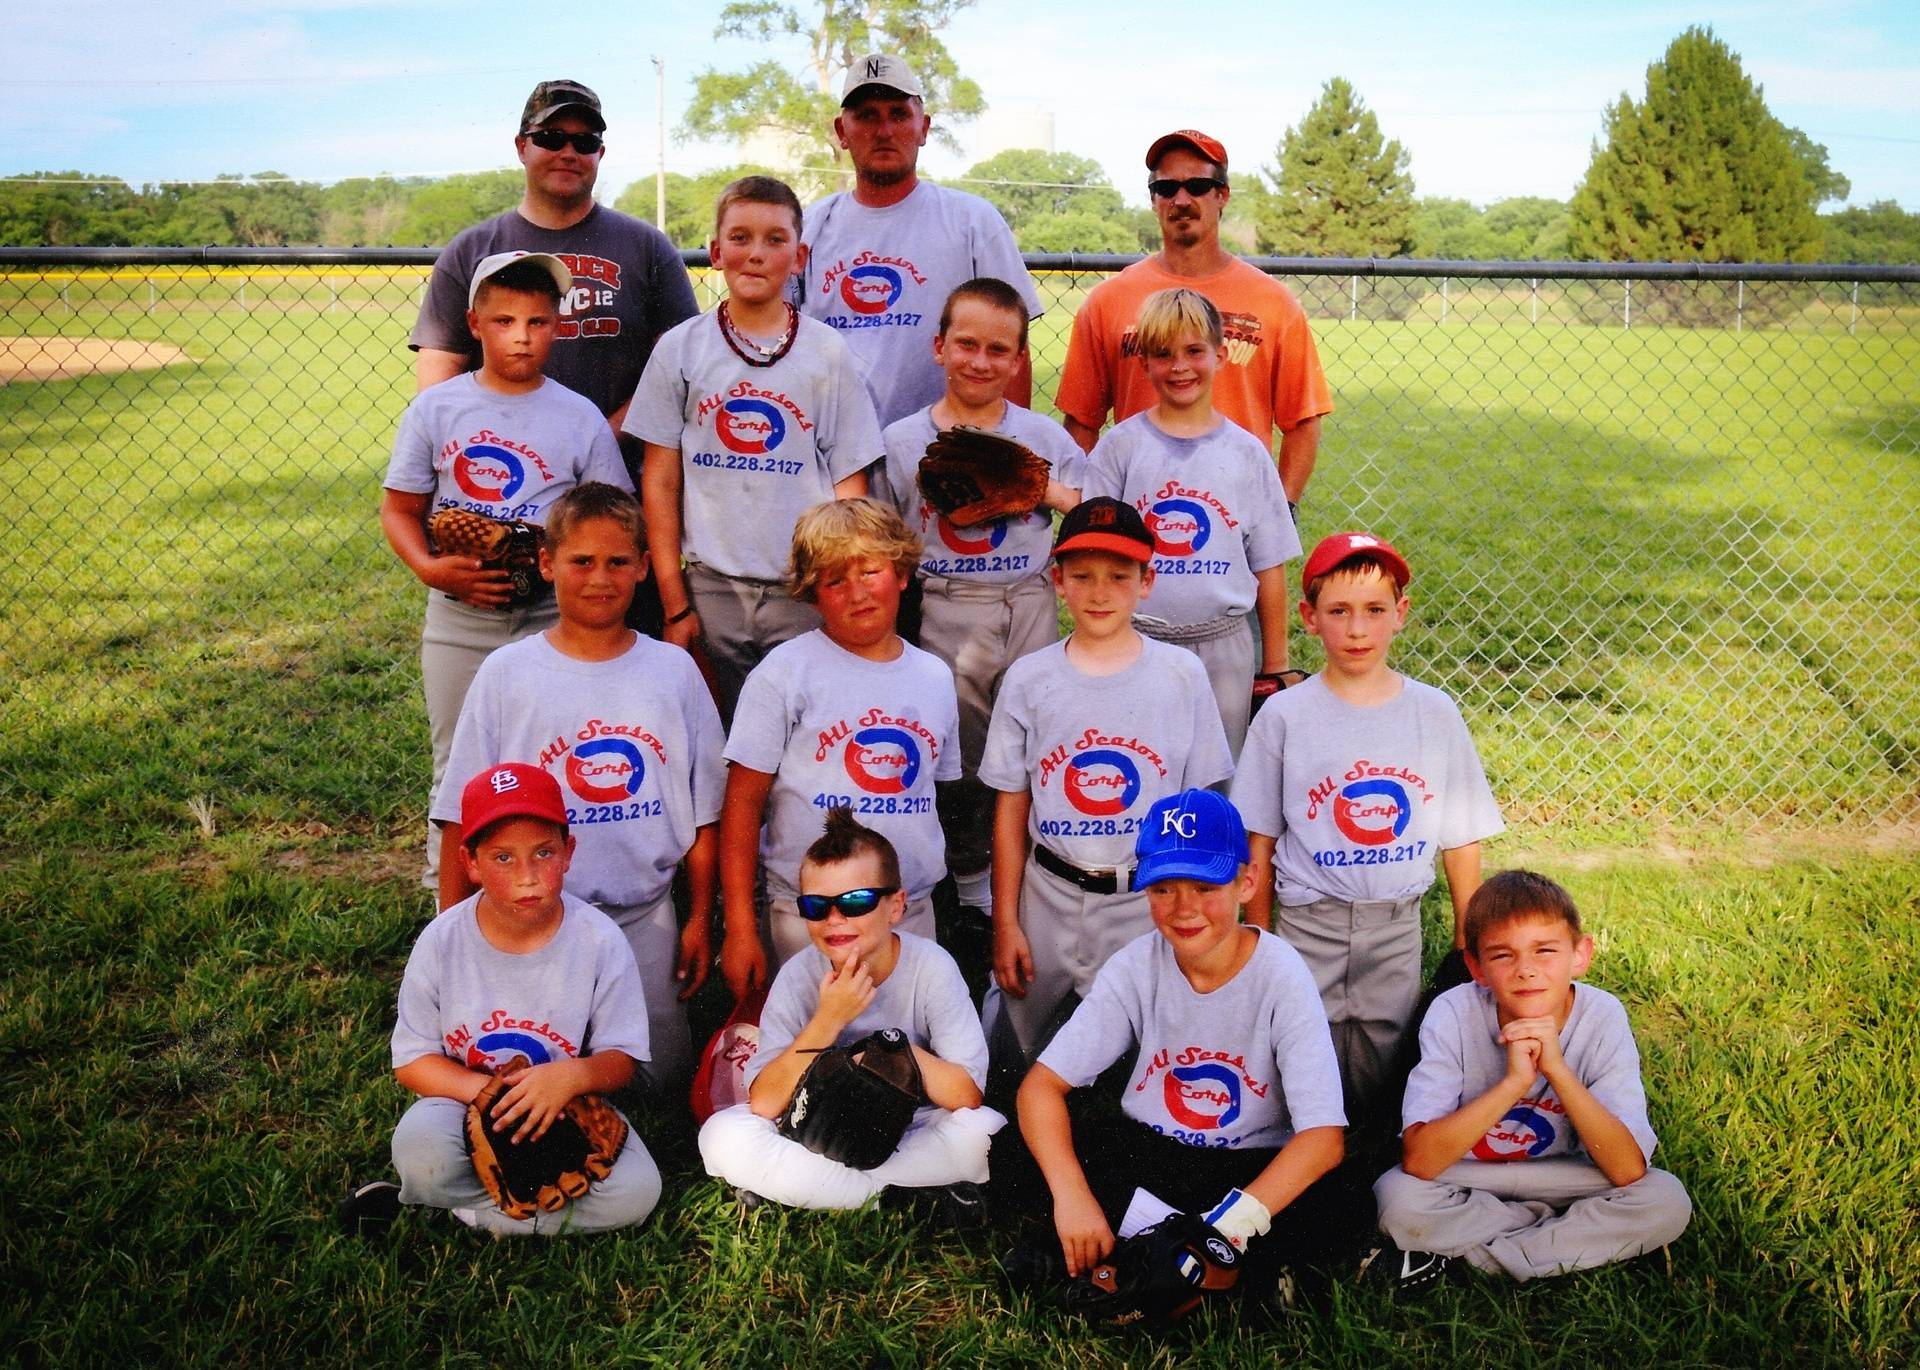 2013 All Seasons YRI Baseball